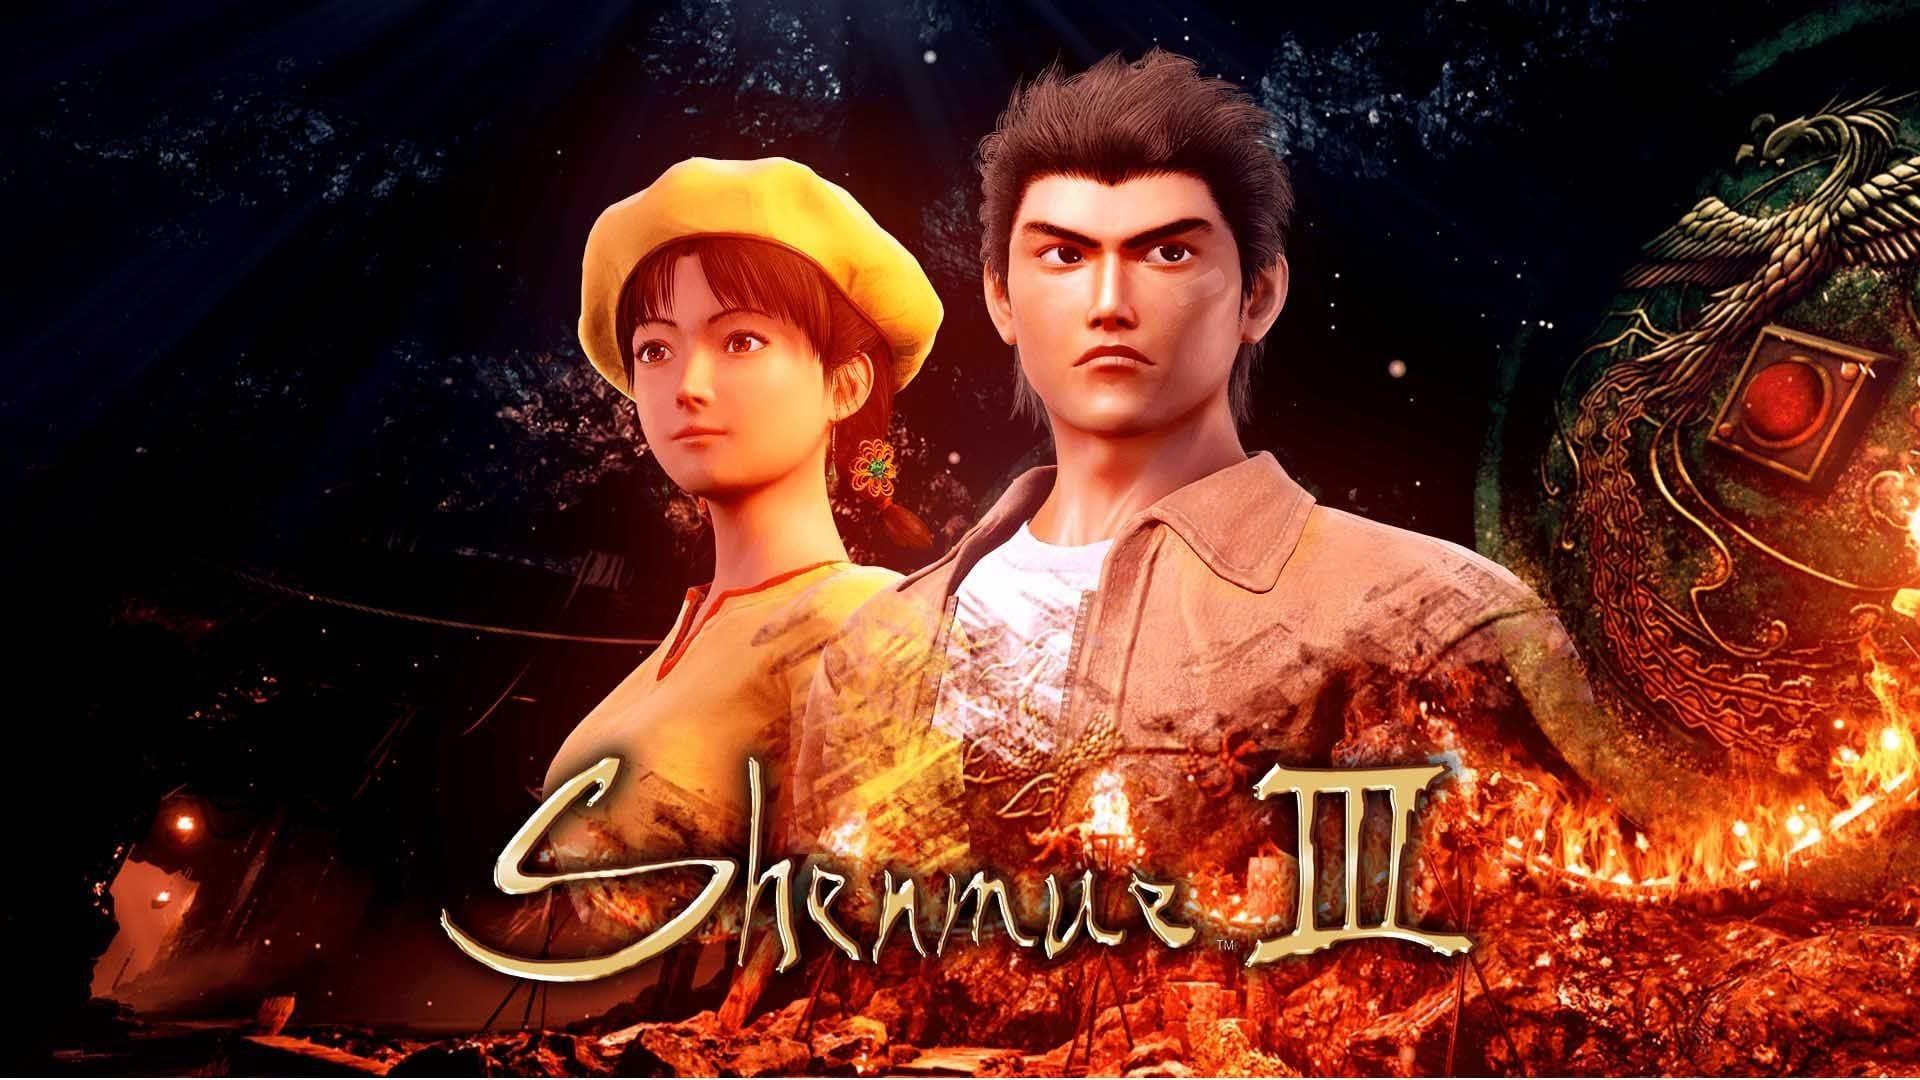 لعبة Shenmue 3